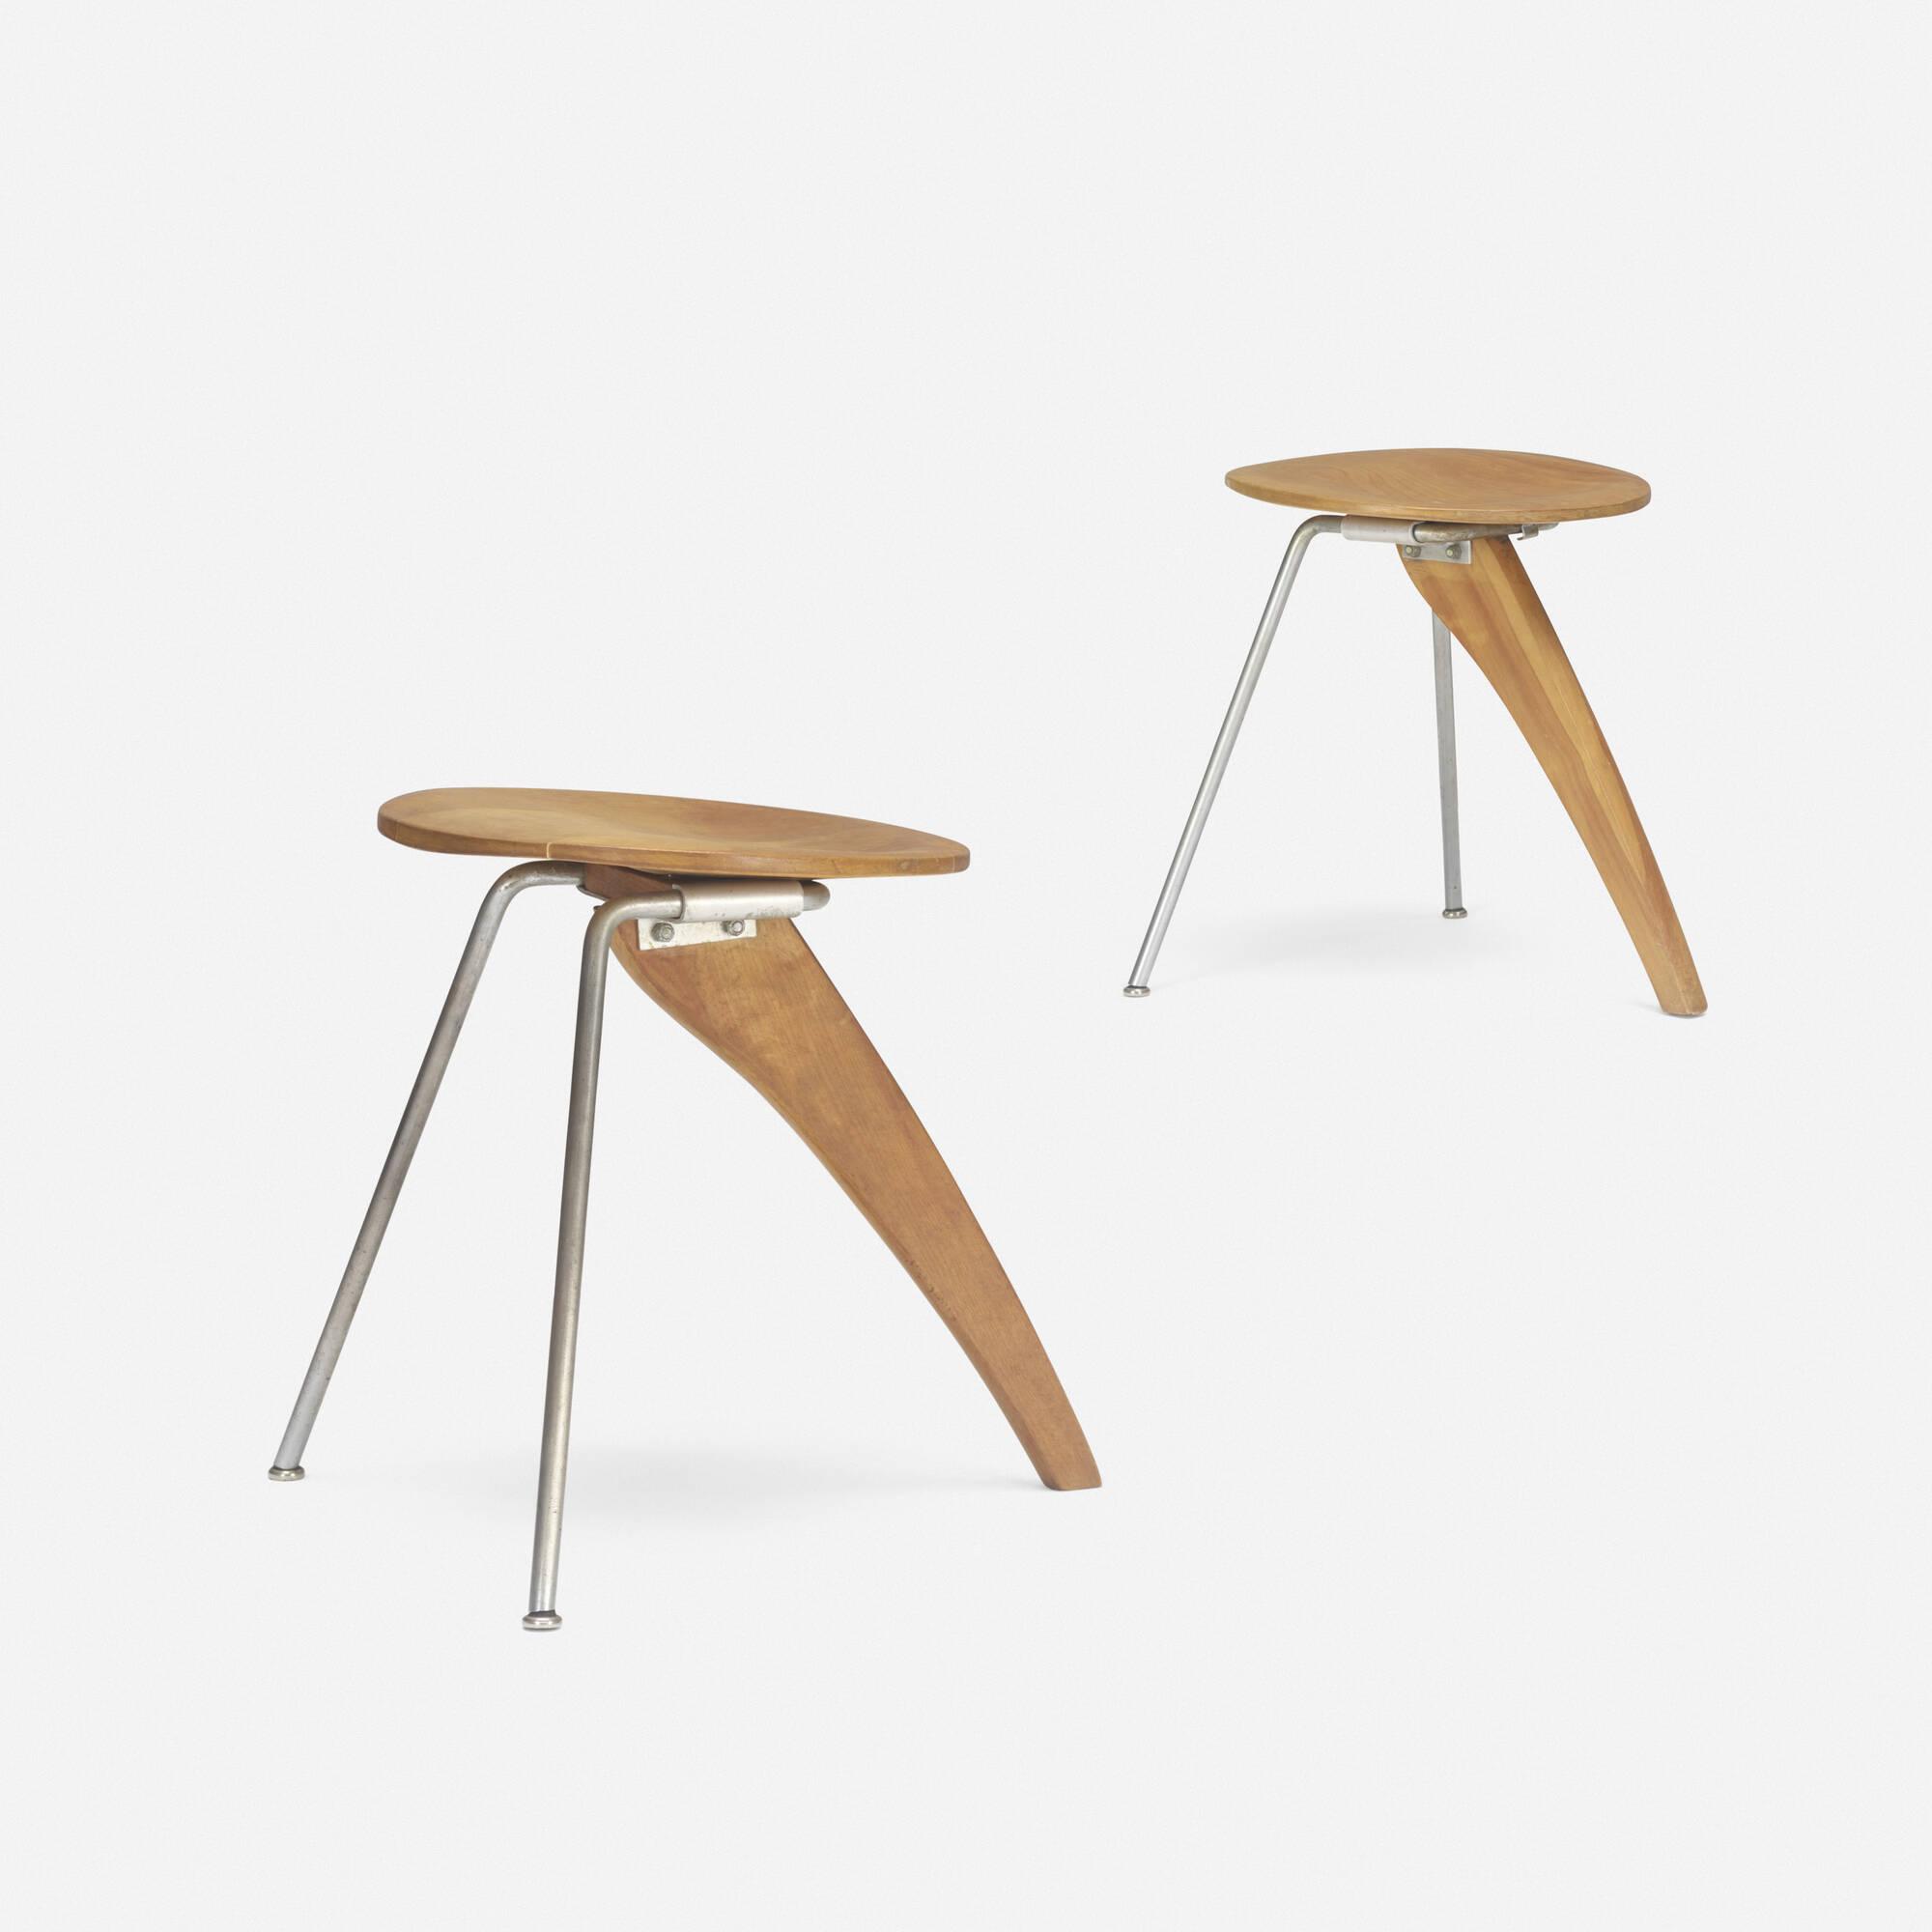 190: Isamu Noguchi / Rudder stools model IN-22, pair (1 of 3)